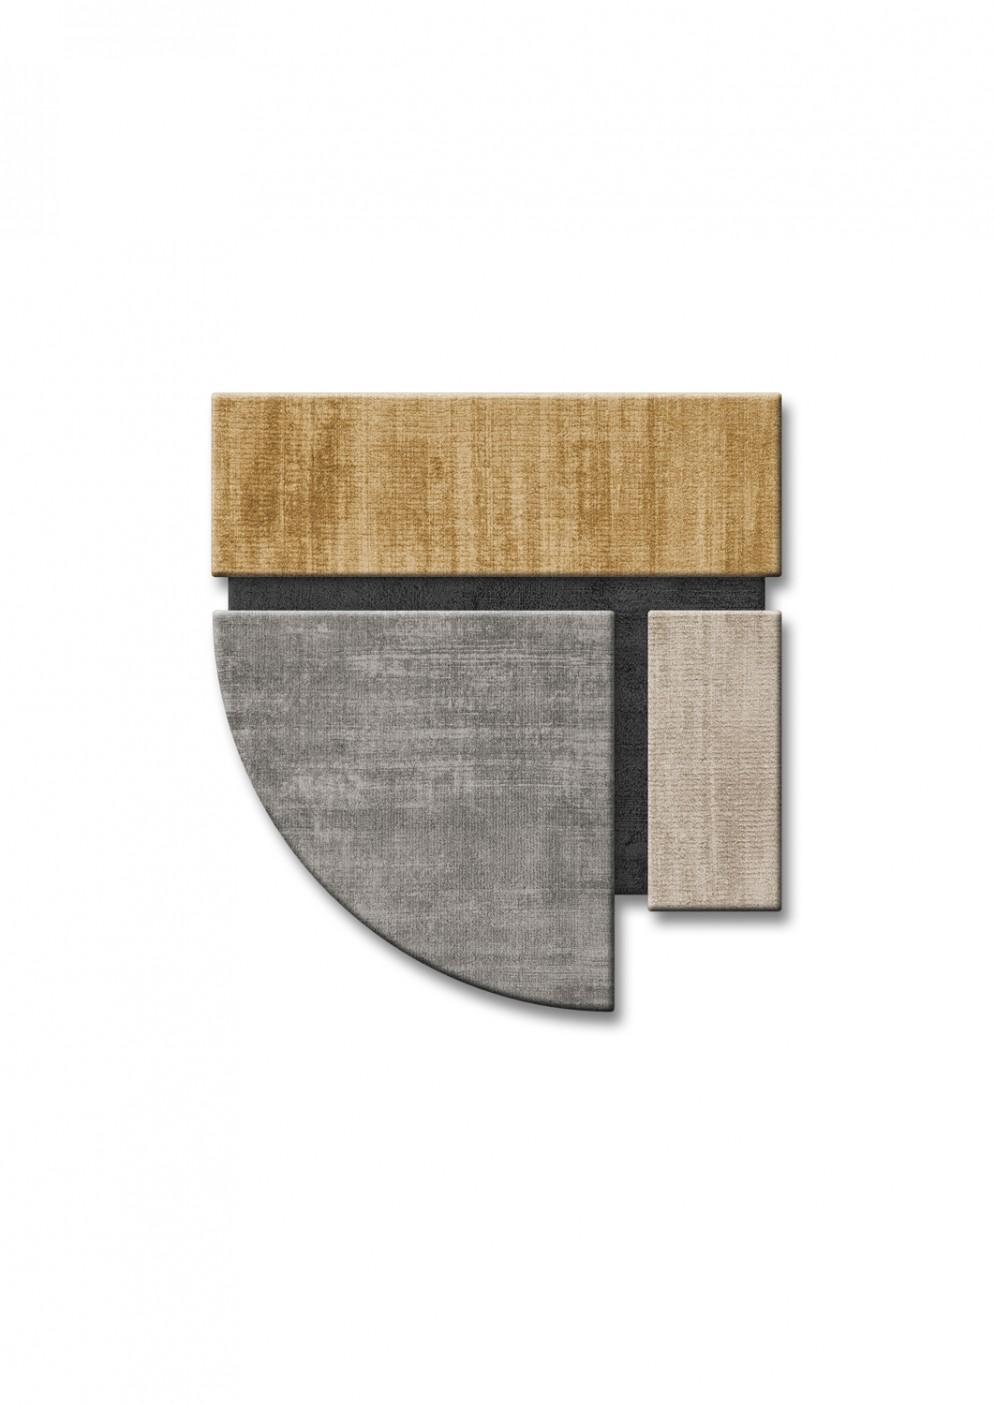 tappeti-moderni-forme-strane-Dainelli Studio_ Sirecom collection 2020_Islands (9)-living-corriere